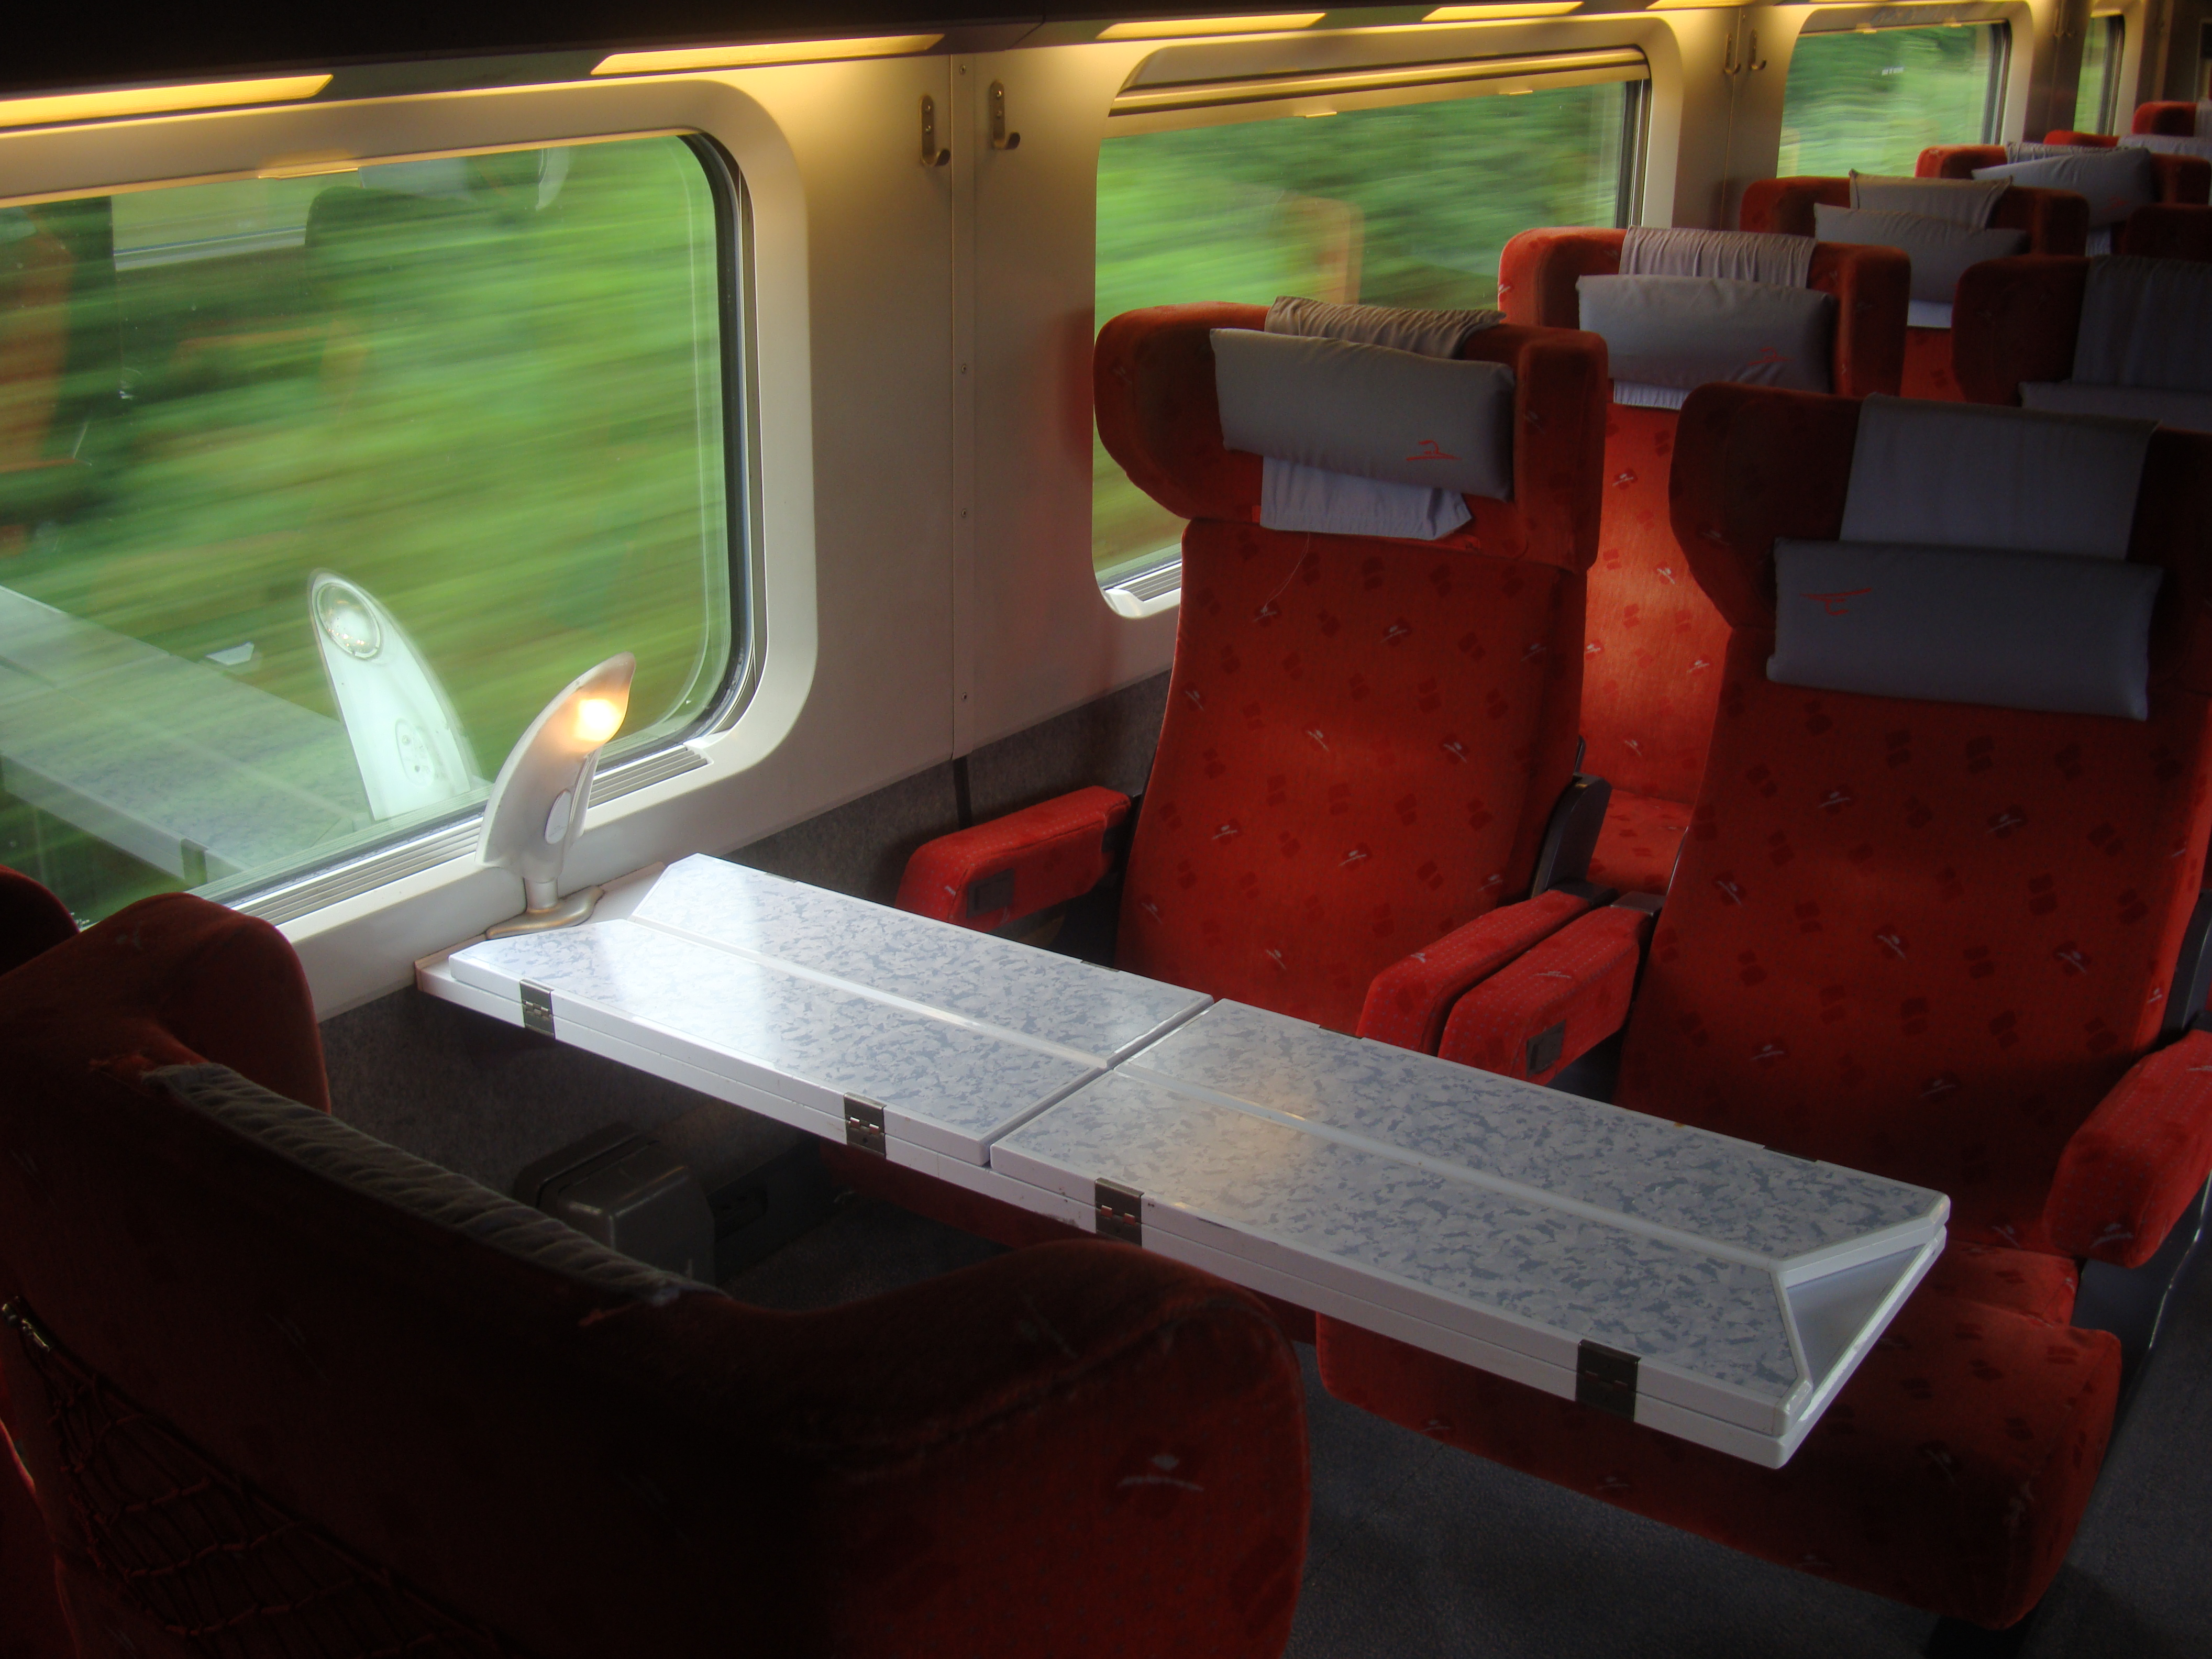 Fichier:Thalys Comfort 1 car.jpg — Wikipédia